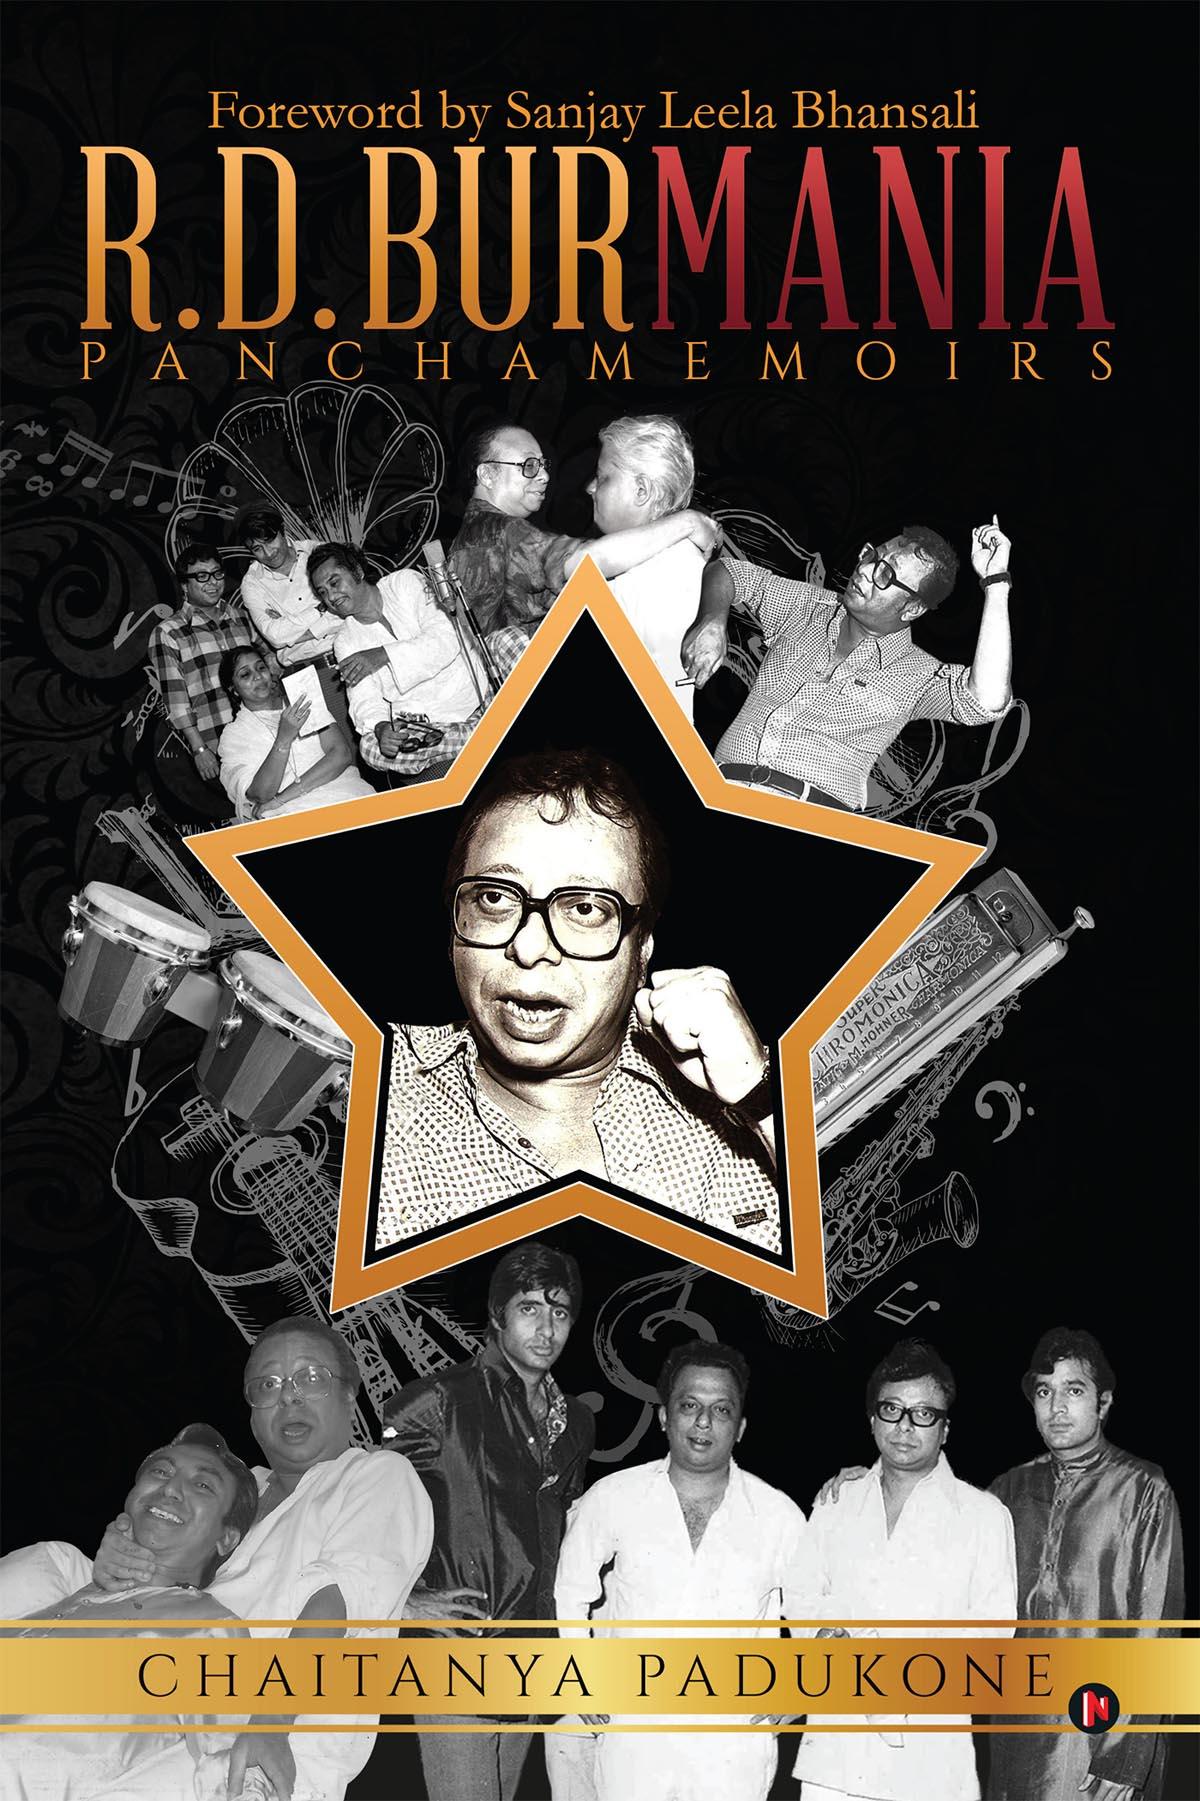 R.D. Burmania _ cover 2 – Rev 8.indd